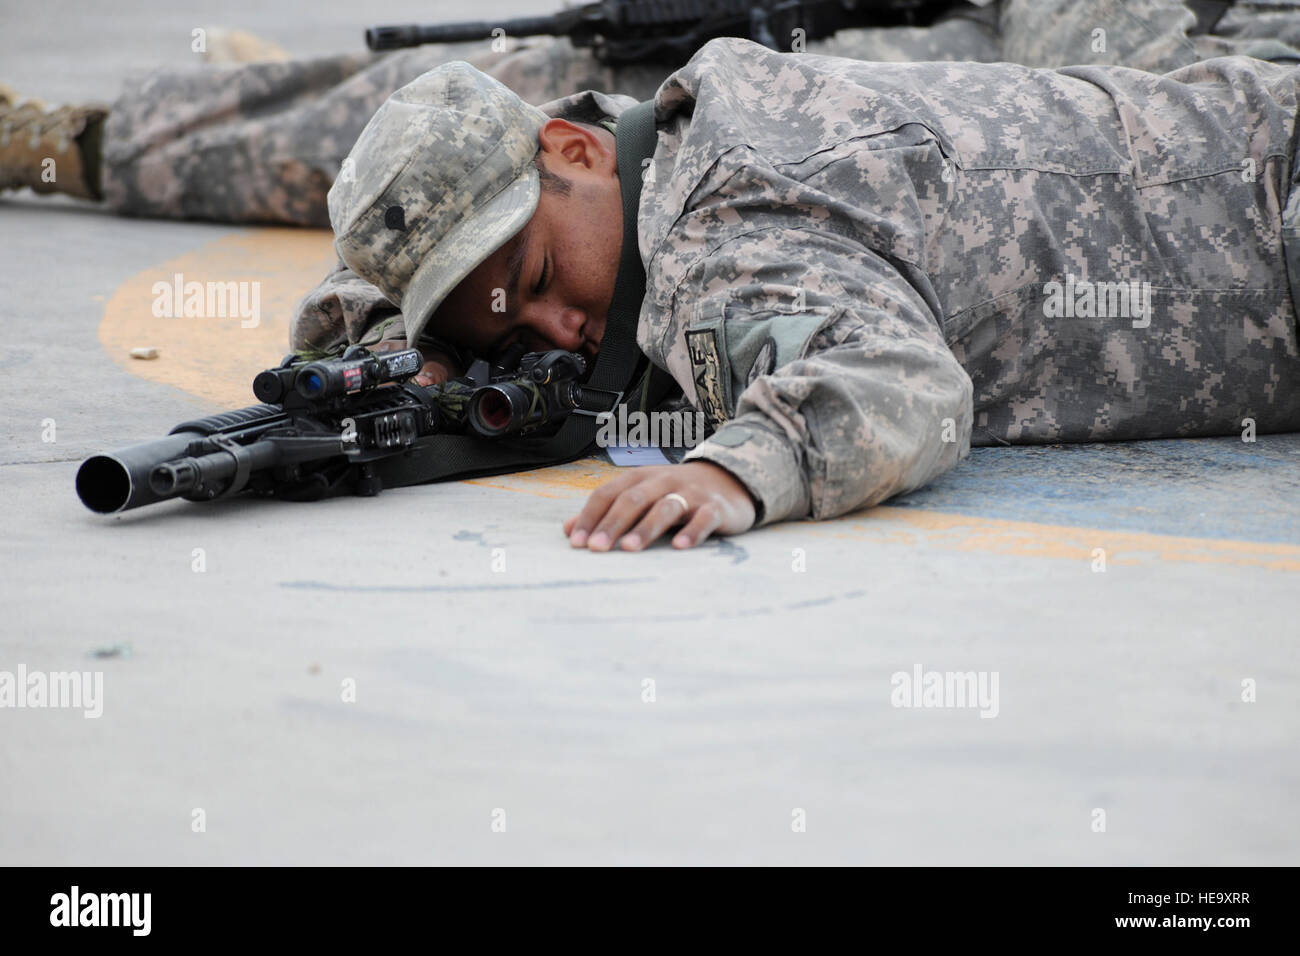 Charmant Us Army Bilderrahmen Ideen - Benutzerdefinierte ...